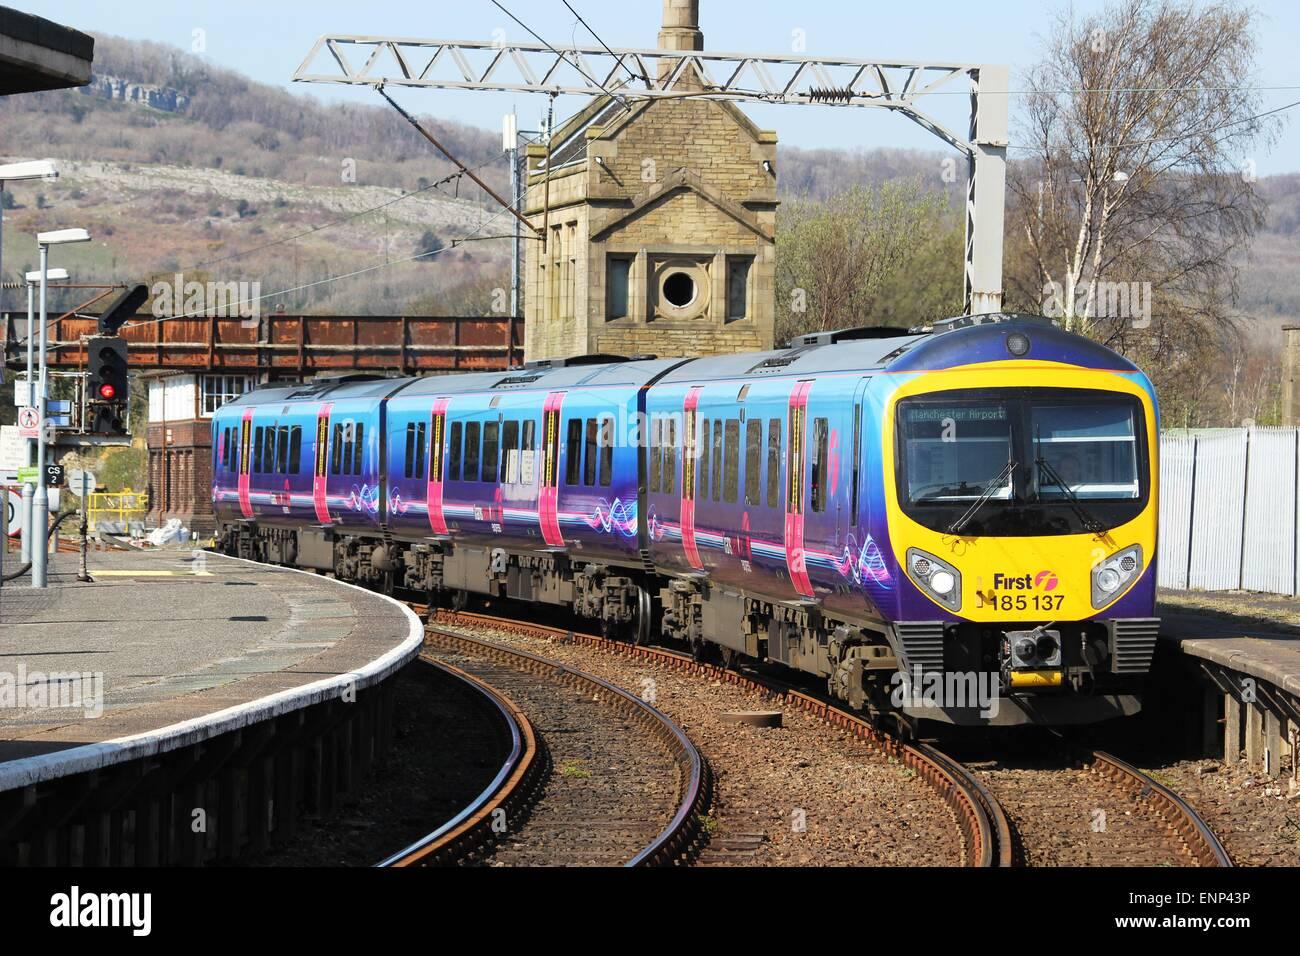 First TransPennine Express Desiro diesel multiple unit train arriving at Carnforth station, Lancashire, England. - Stock Image